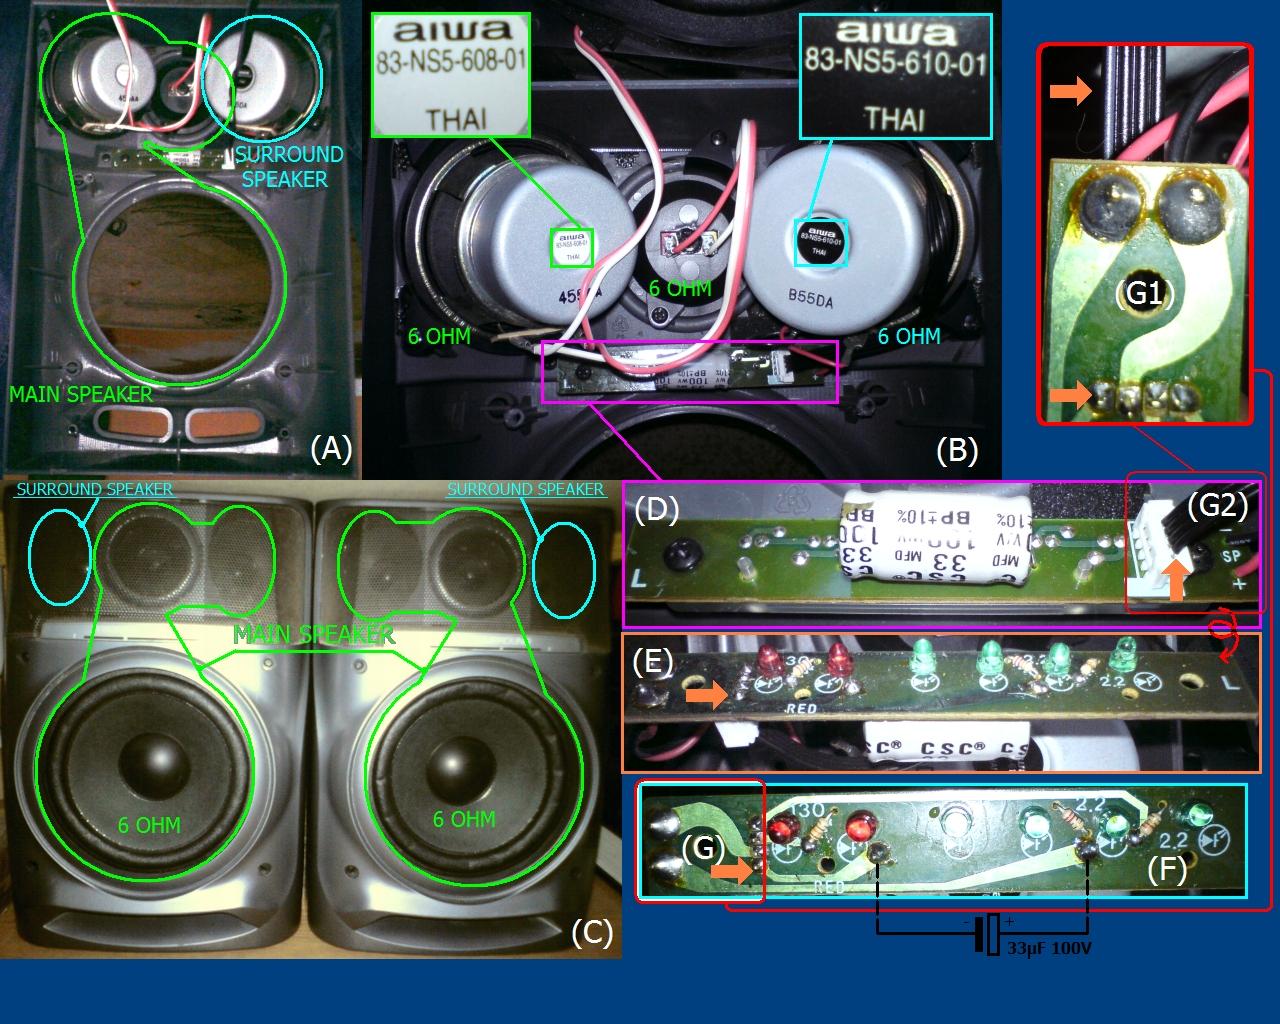 Speaker Diagram And Parts List For Panasonic Audioequipmentparts